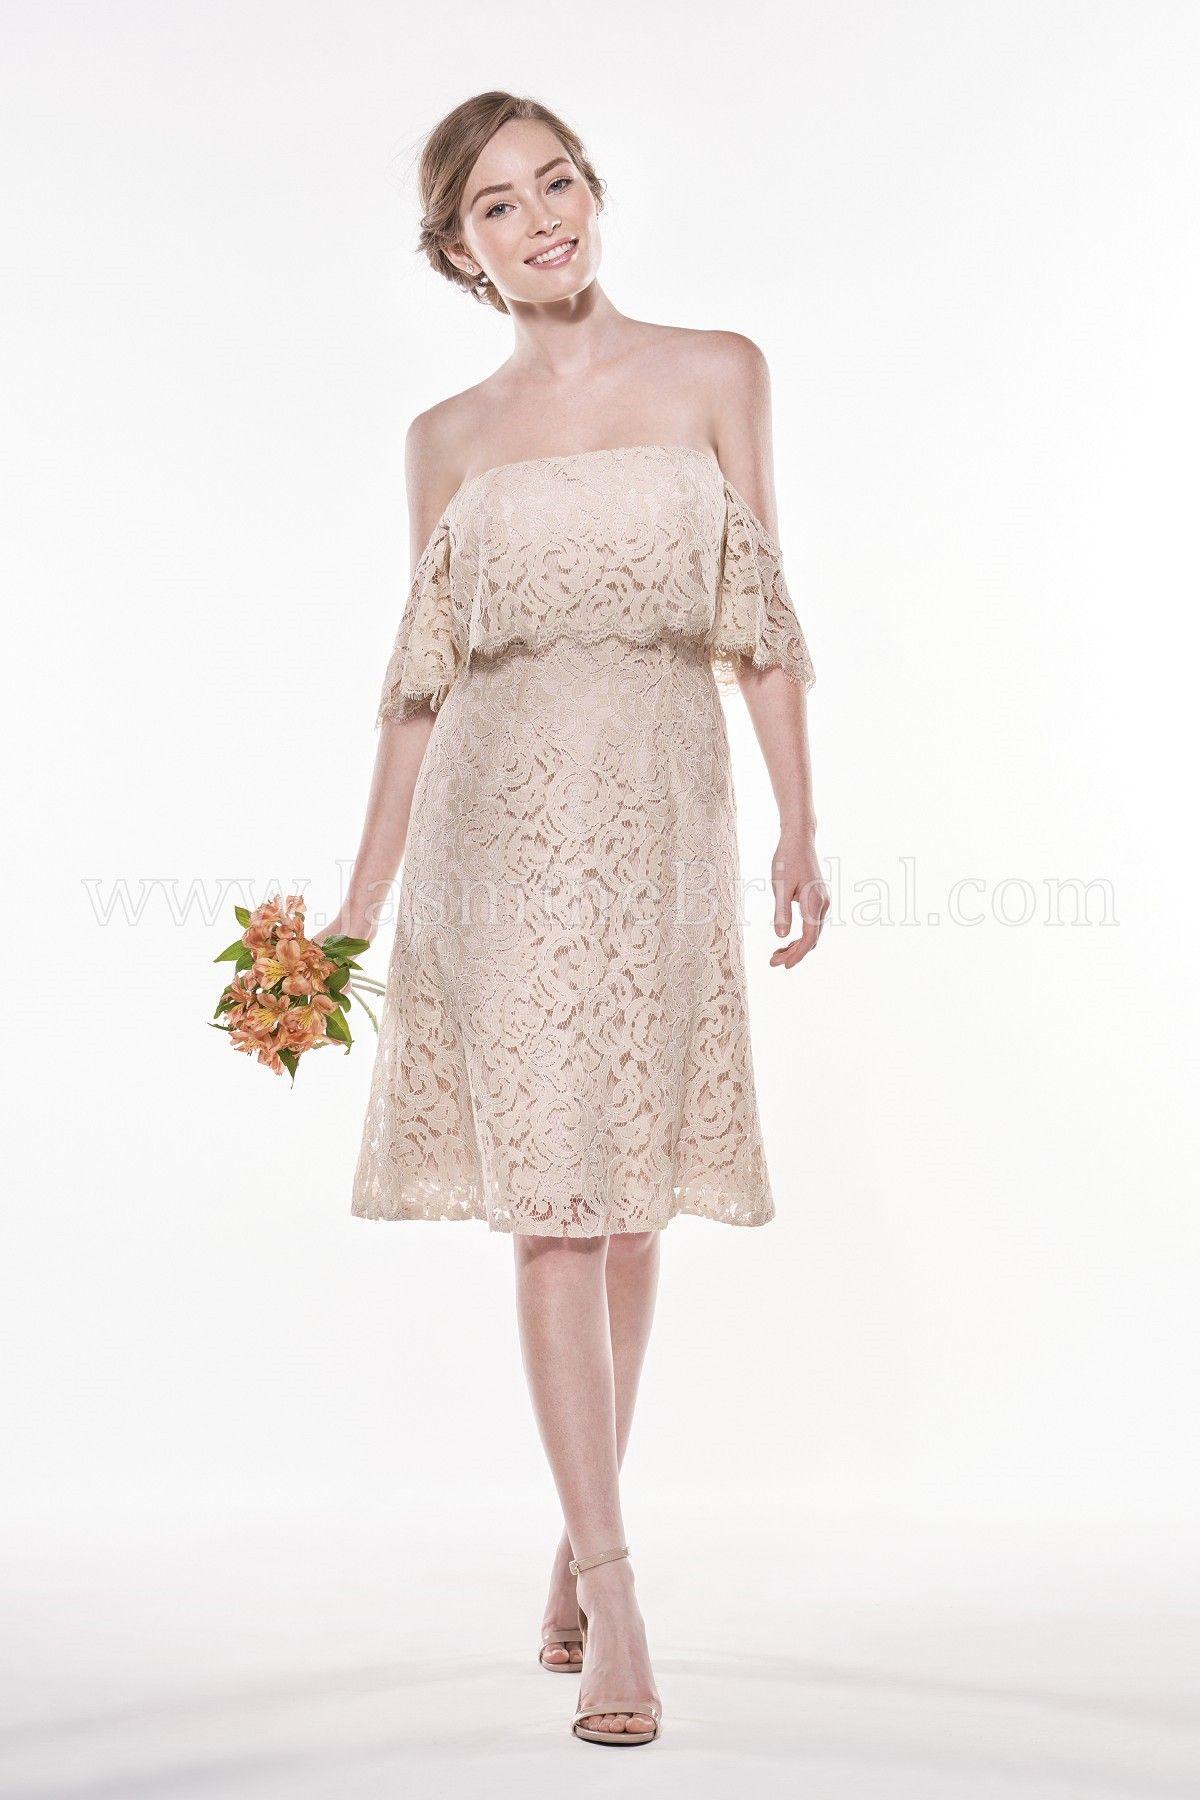 Jasmine Bridal | Jasmine Bridesmaids Style P196015K in Almond ...